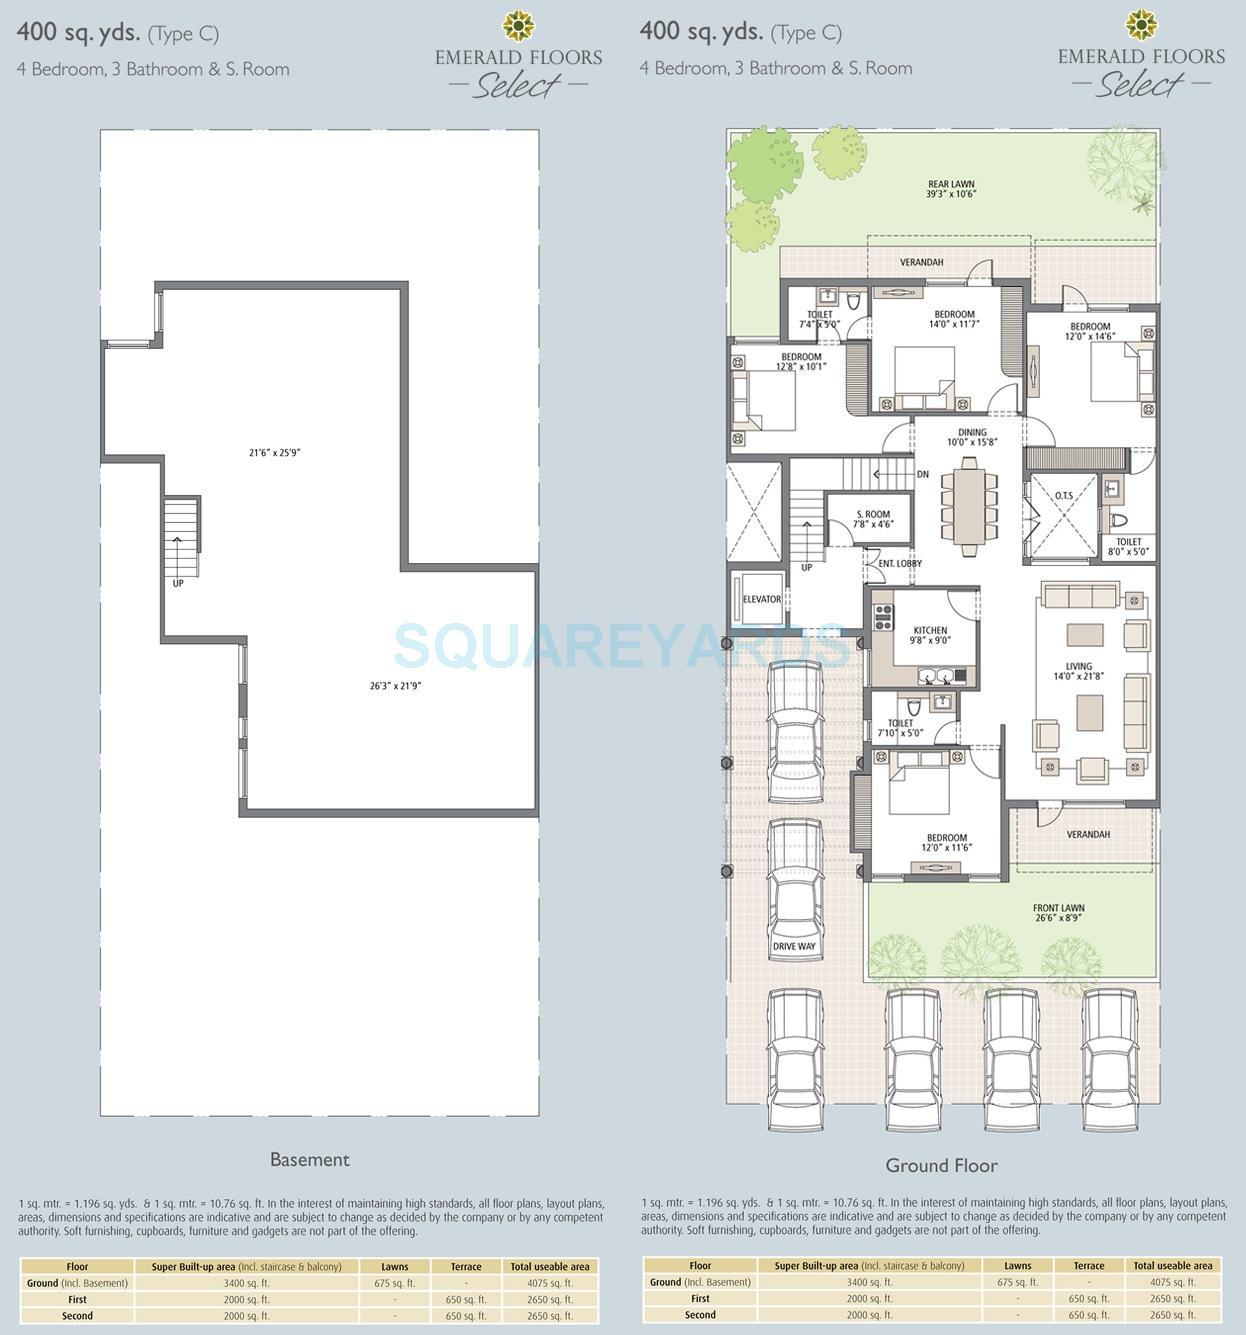 emaar mgf emerald floors select independent floor 4bhk sq 3400sqft 1